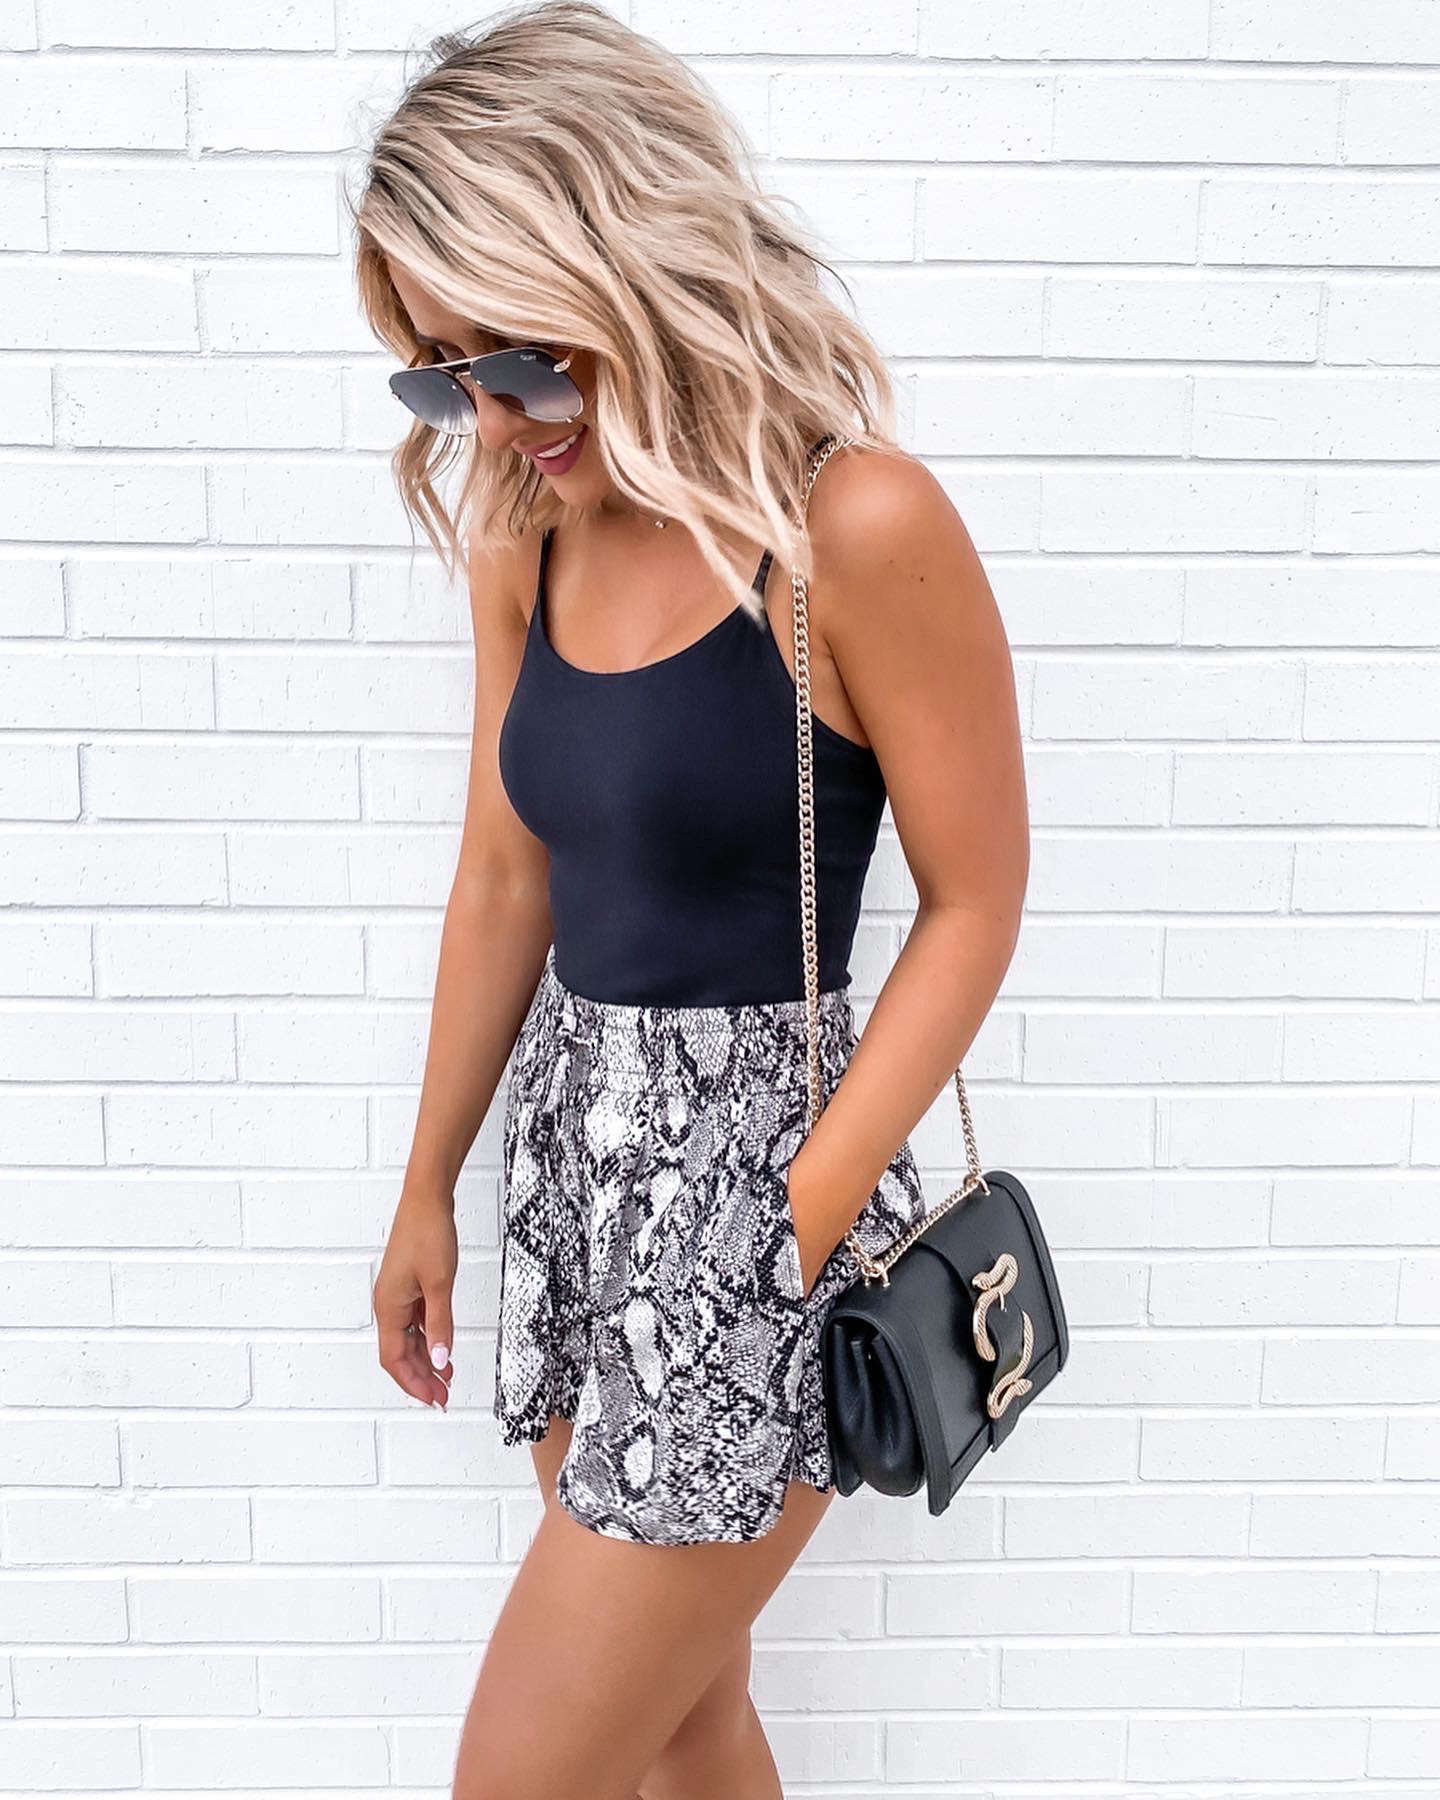 Laura Beverlin Day to night outfit snakeskin shorts black cami black blazer snake crossbody bag3